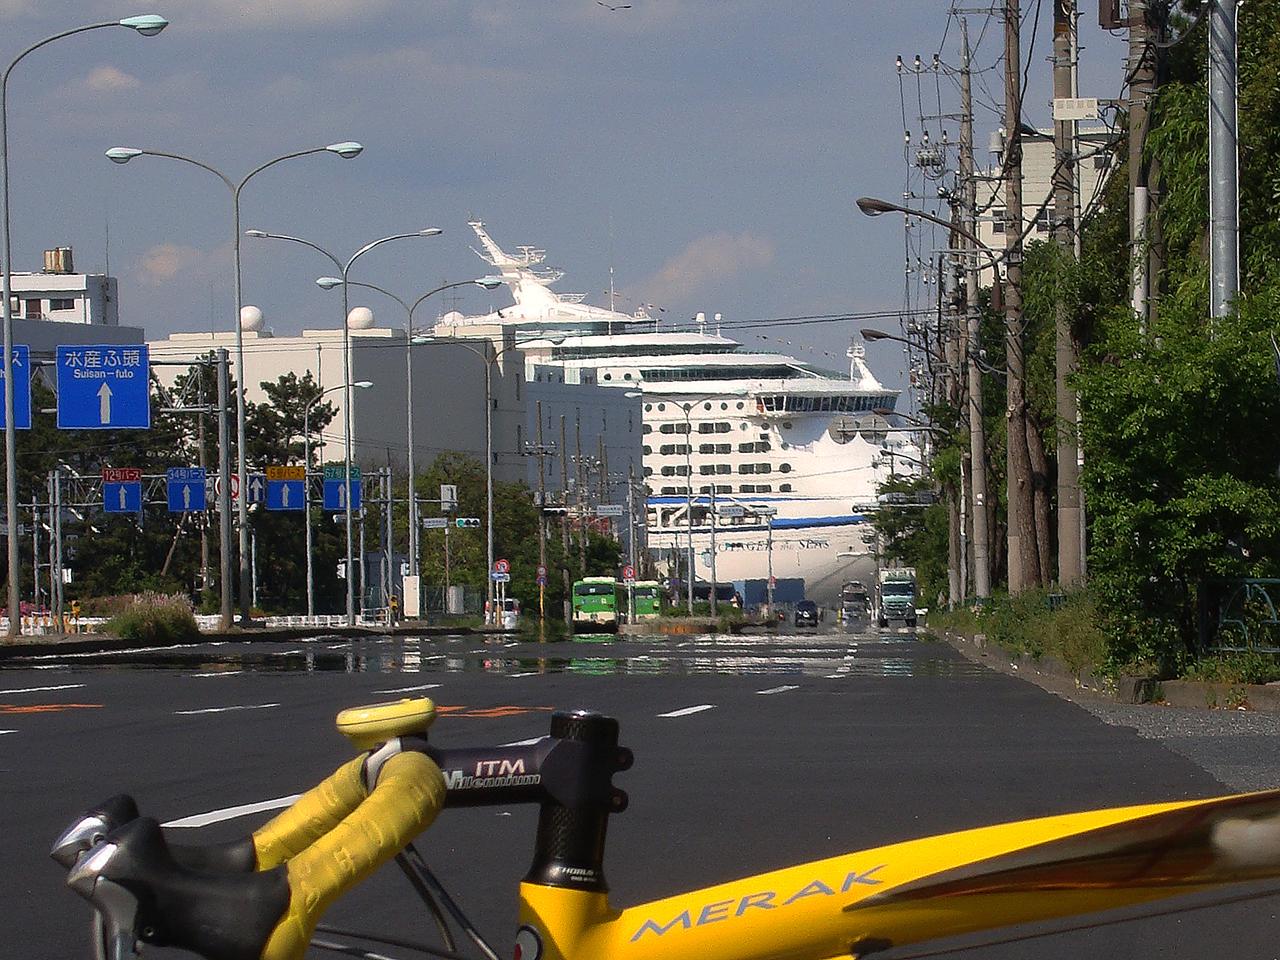 http://moritetsu.info/bicycle/img/DSC06460sssss.jpg